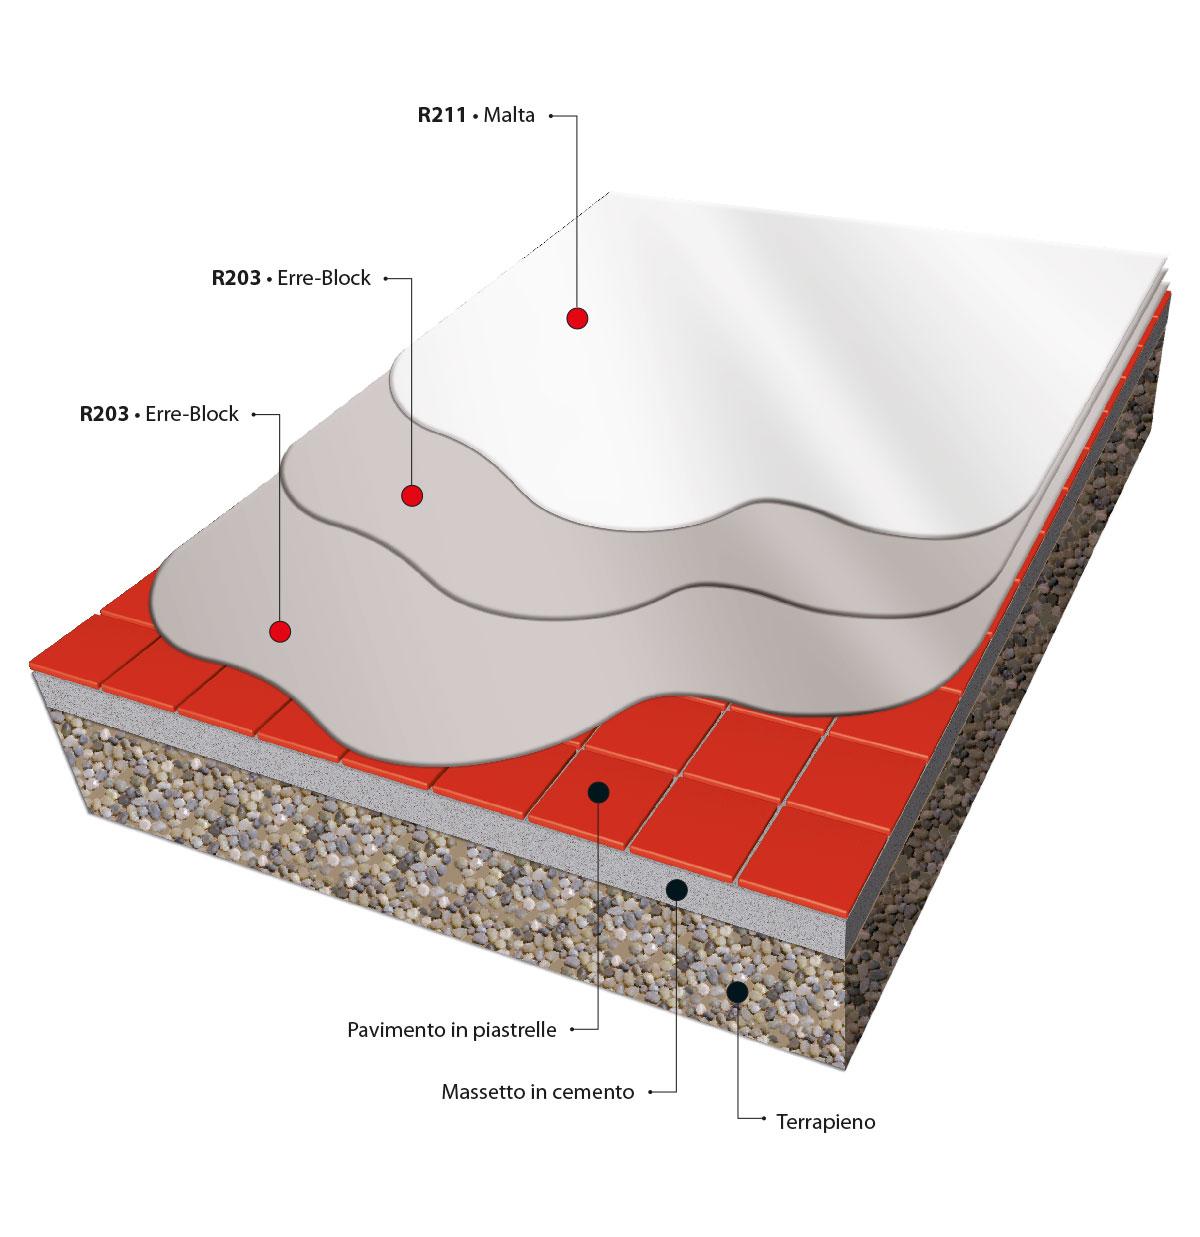 ErreLab_preparazione_piastrelle_tiles_su_terrapieno